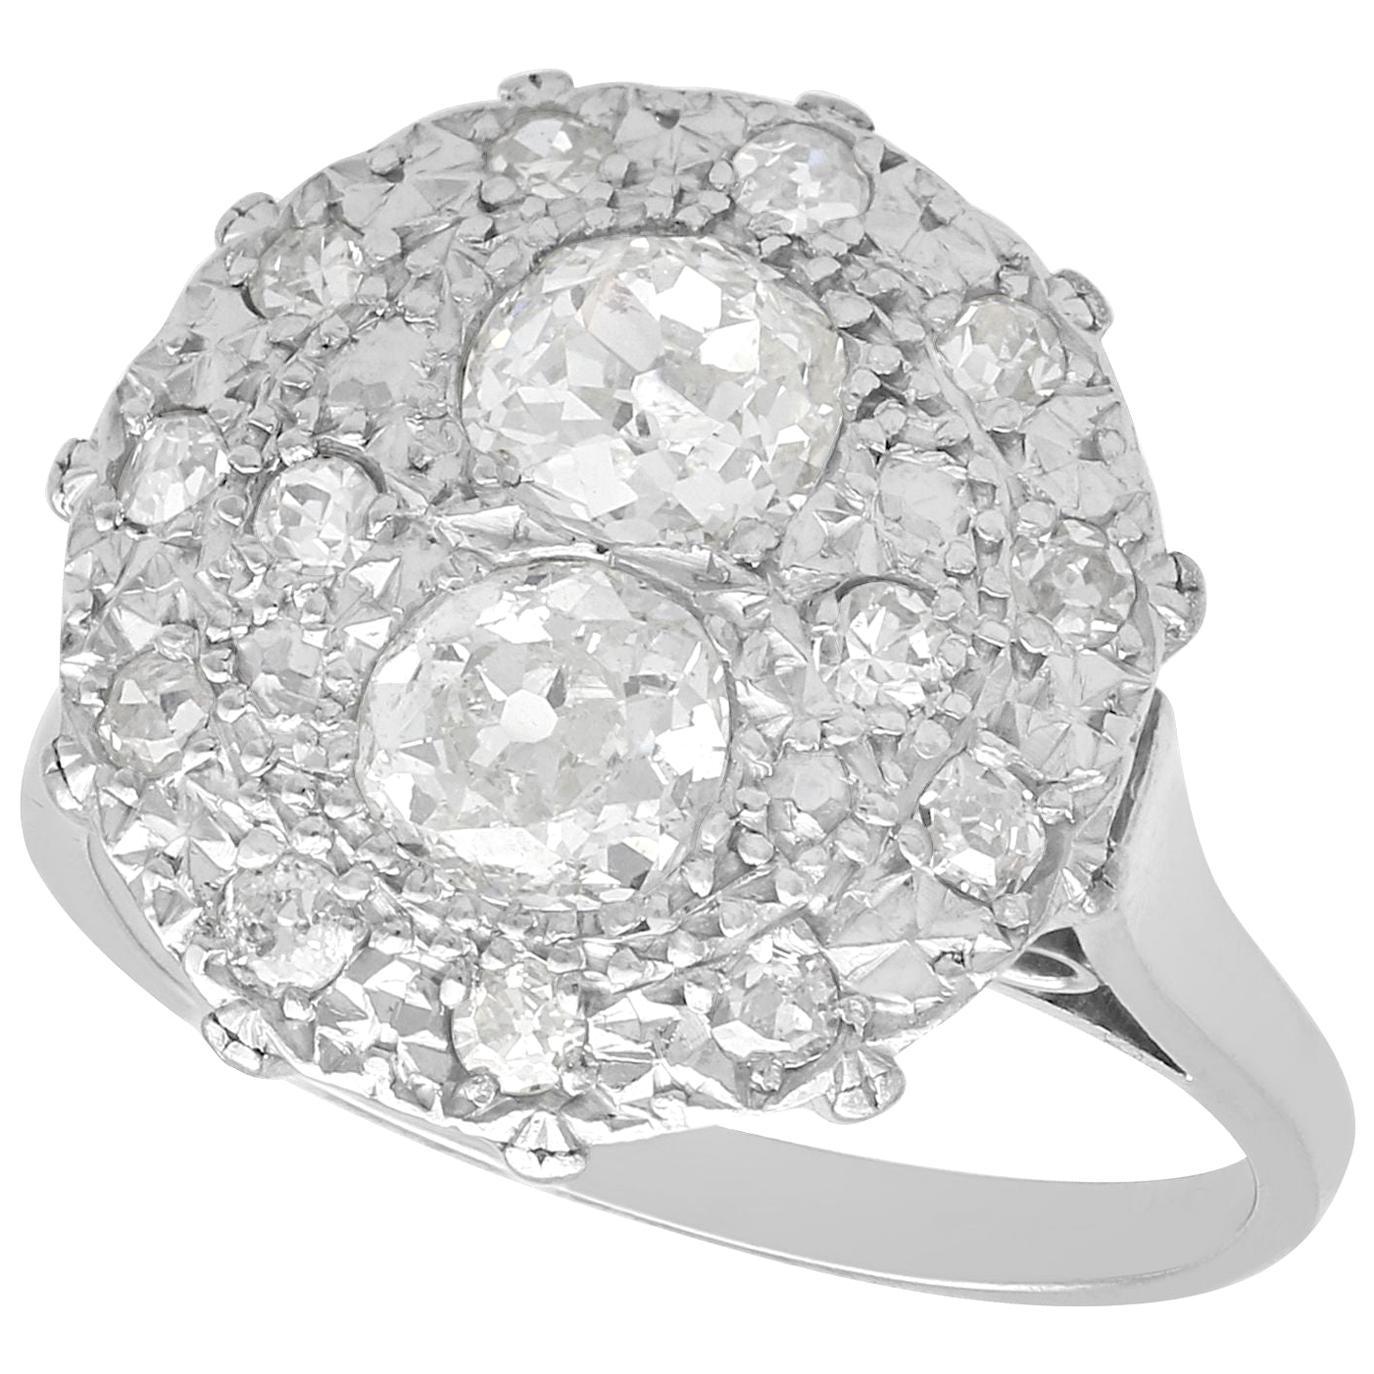 1.53 Carat Diamond and Platinum Cocktail Ring Vintage, circa 1950